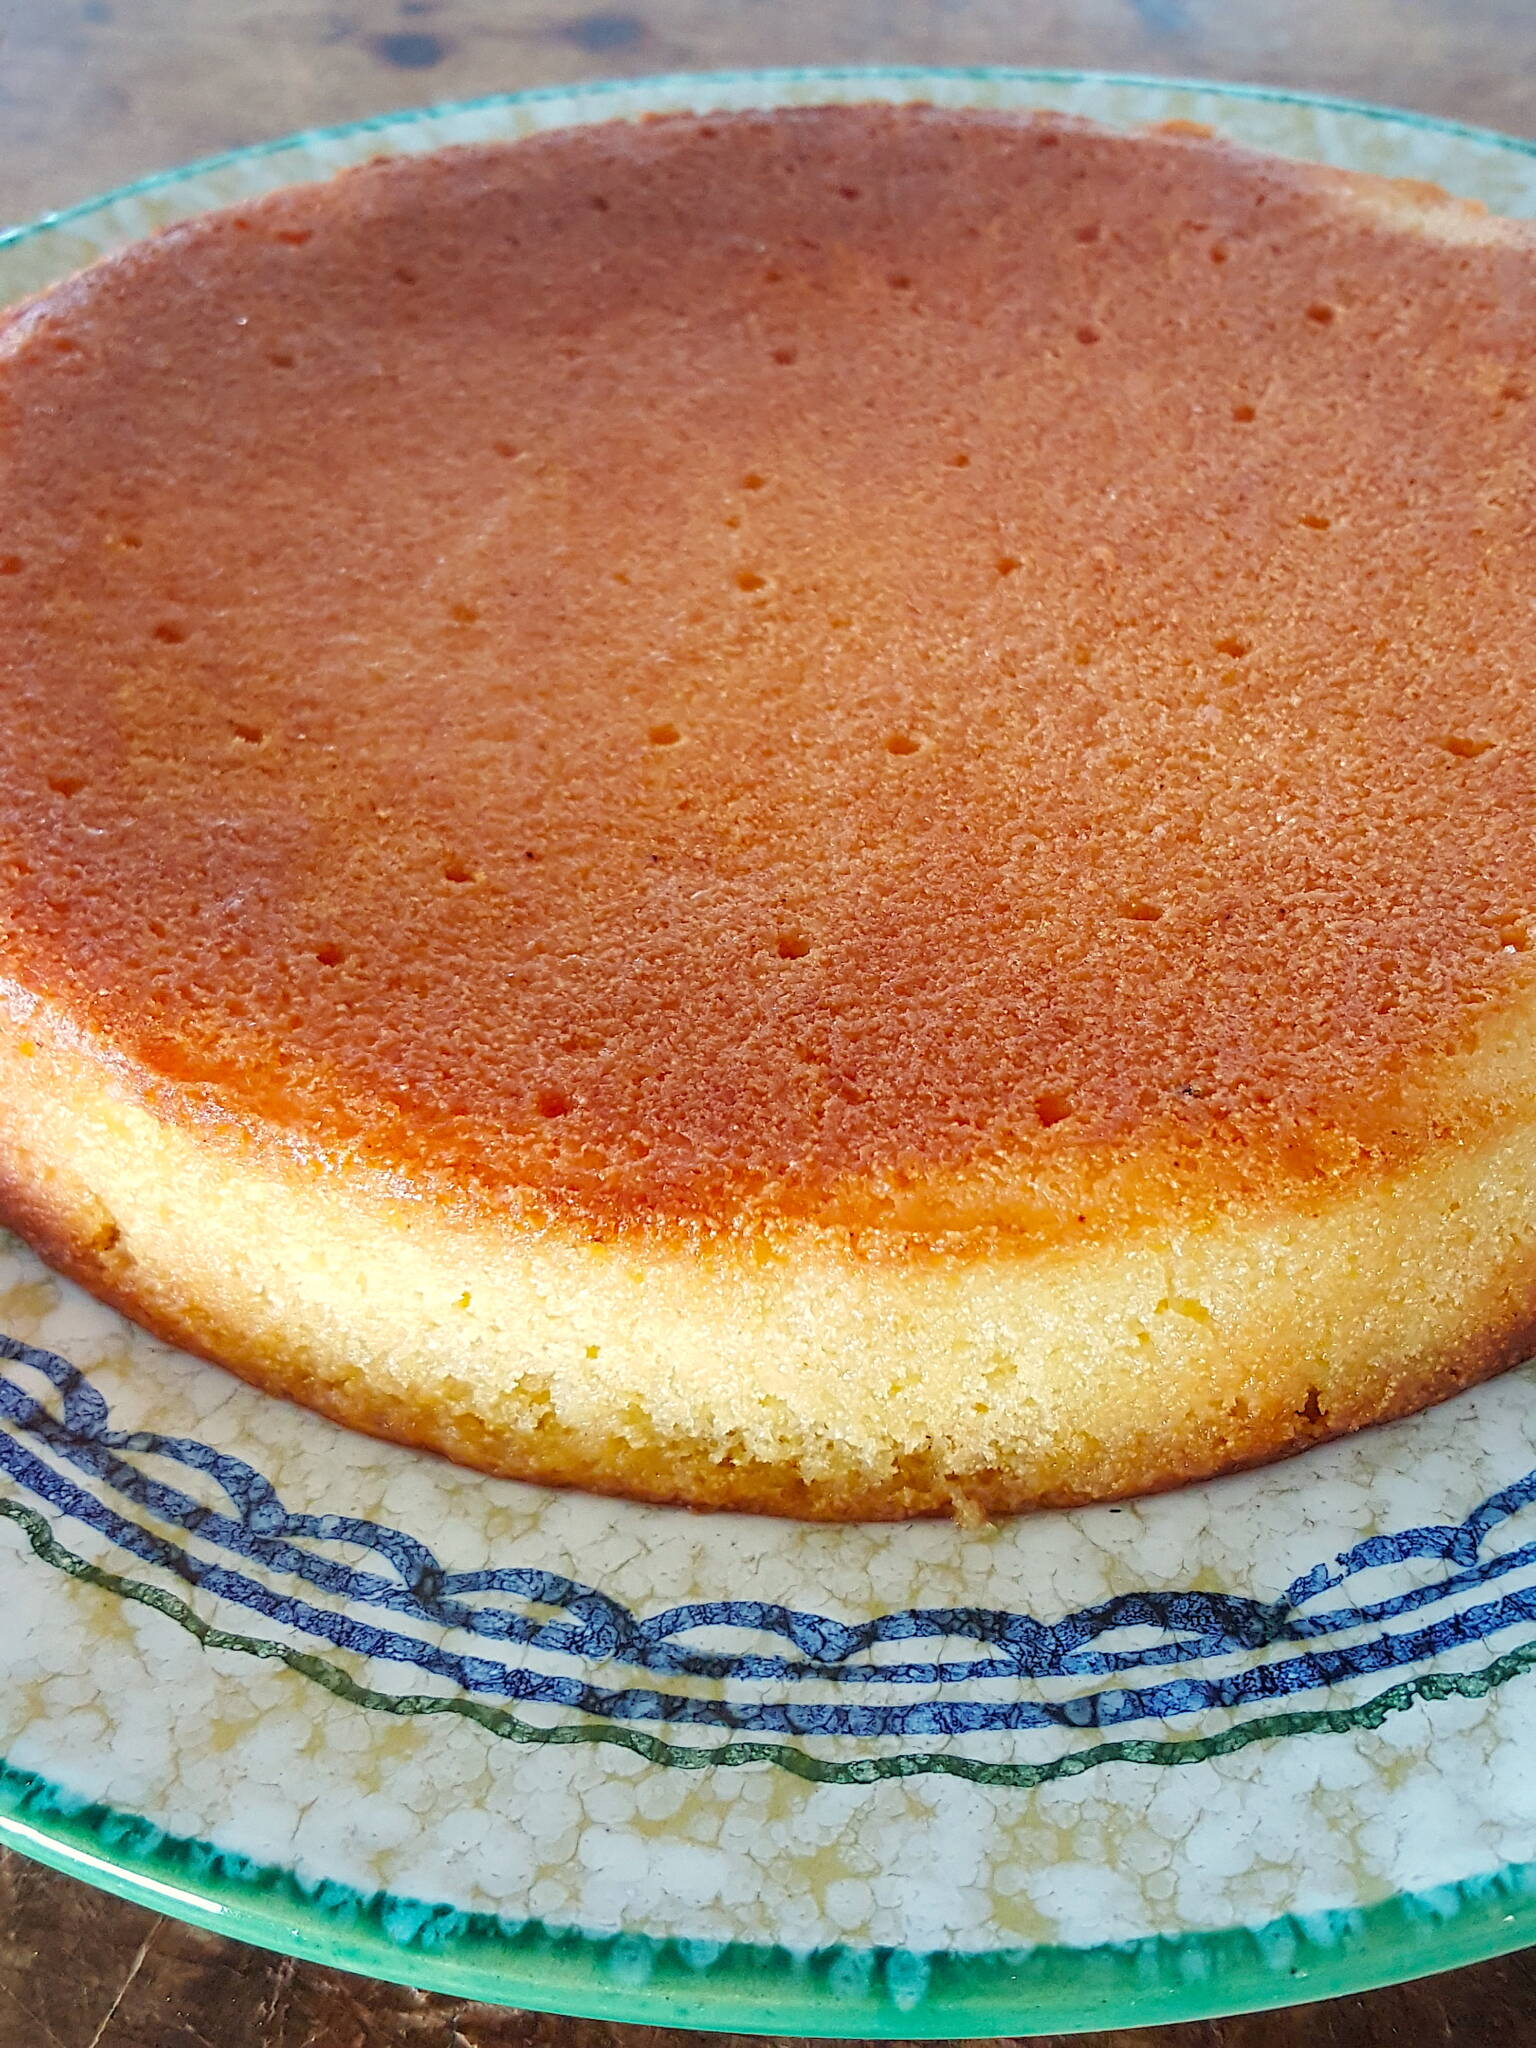 Drizzle with lemon glaze for extra deep lemony flavour